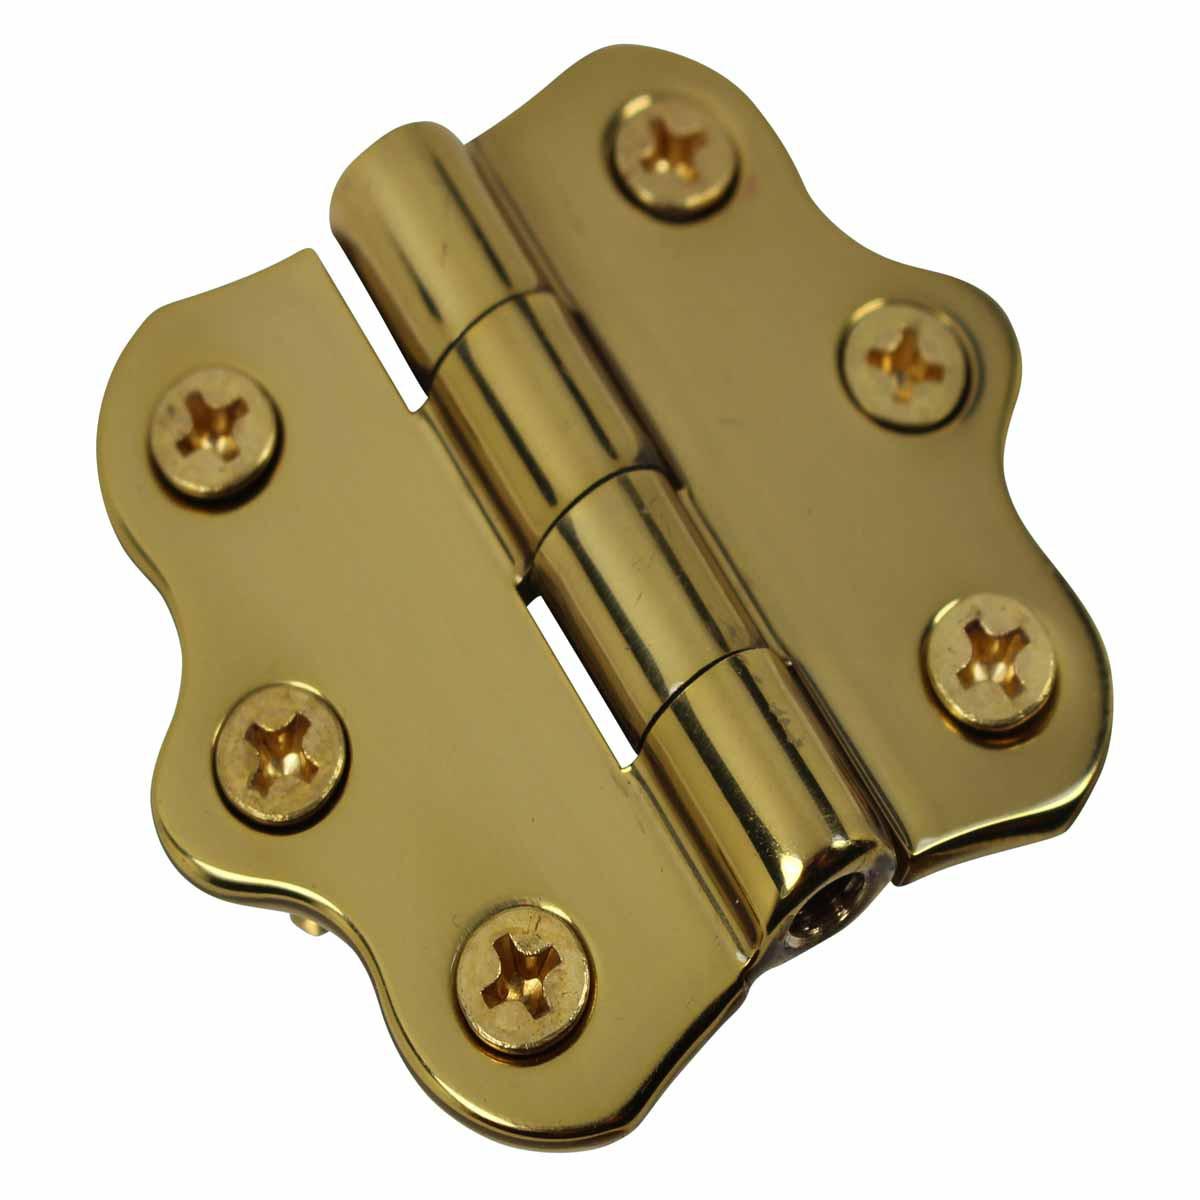 Cabinet Hinge Polished Brass No Finials 1 716H x 2W Door Hinges Door Hinge Solid Brass Hinge